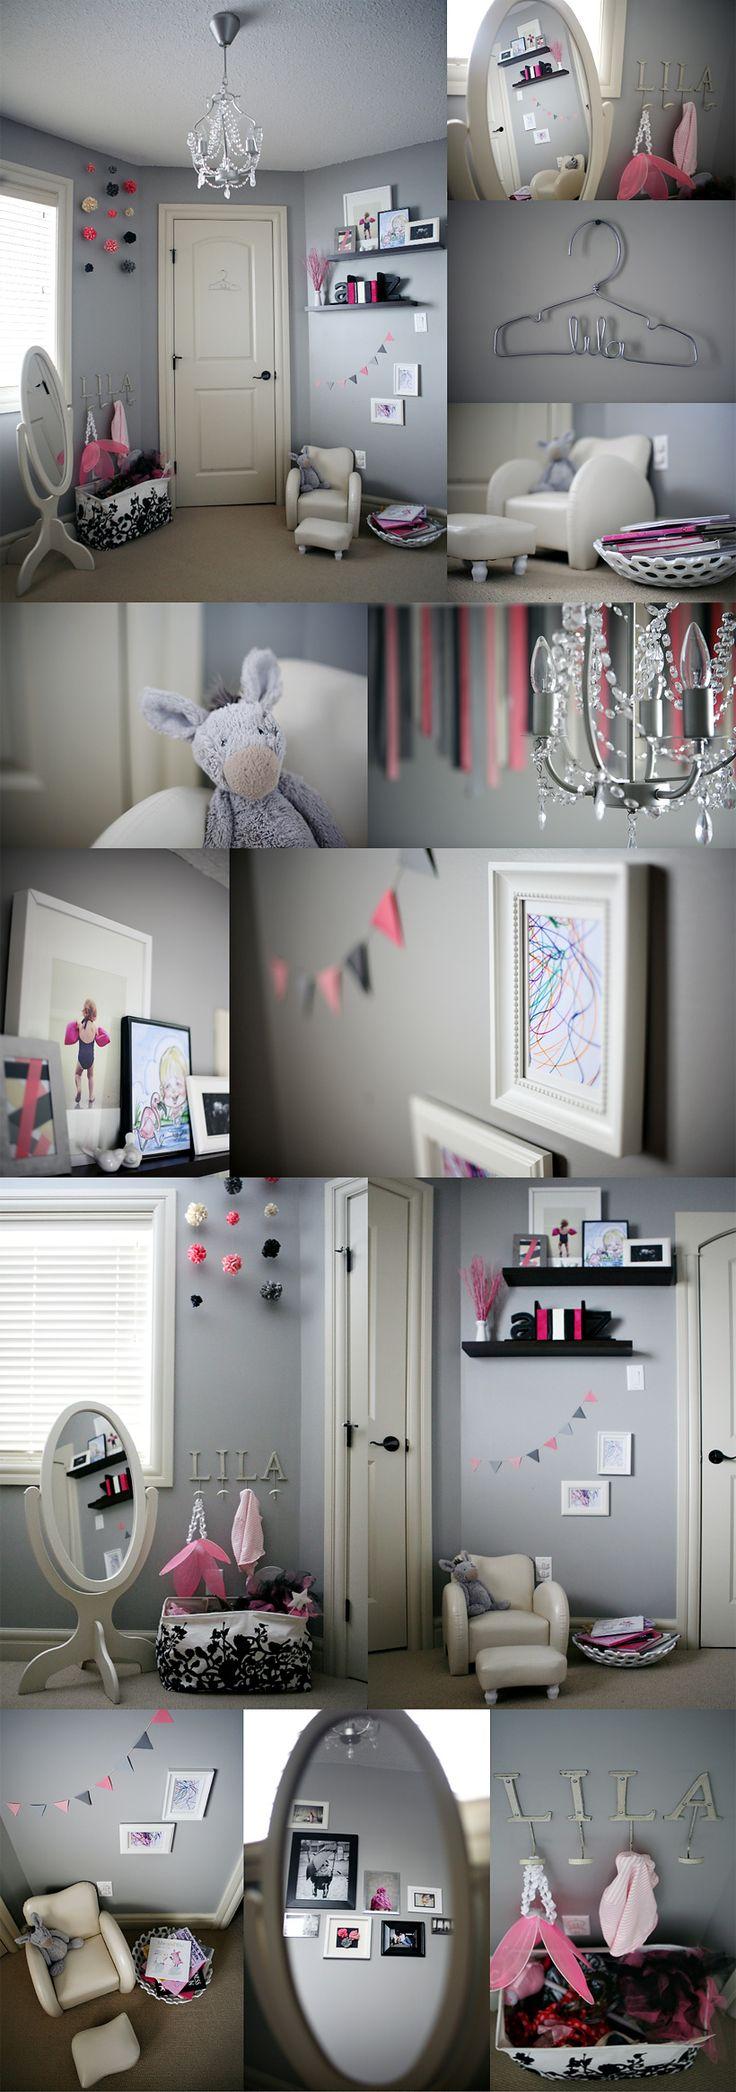 Cute ideas here for a little girls room. chambre bébé fille gris et rose